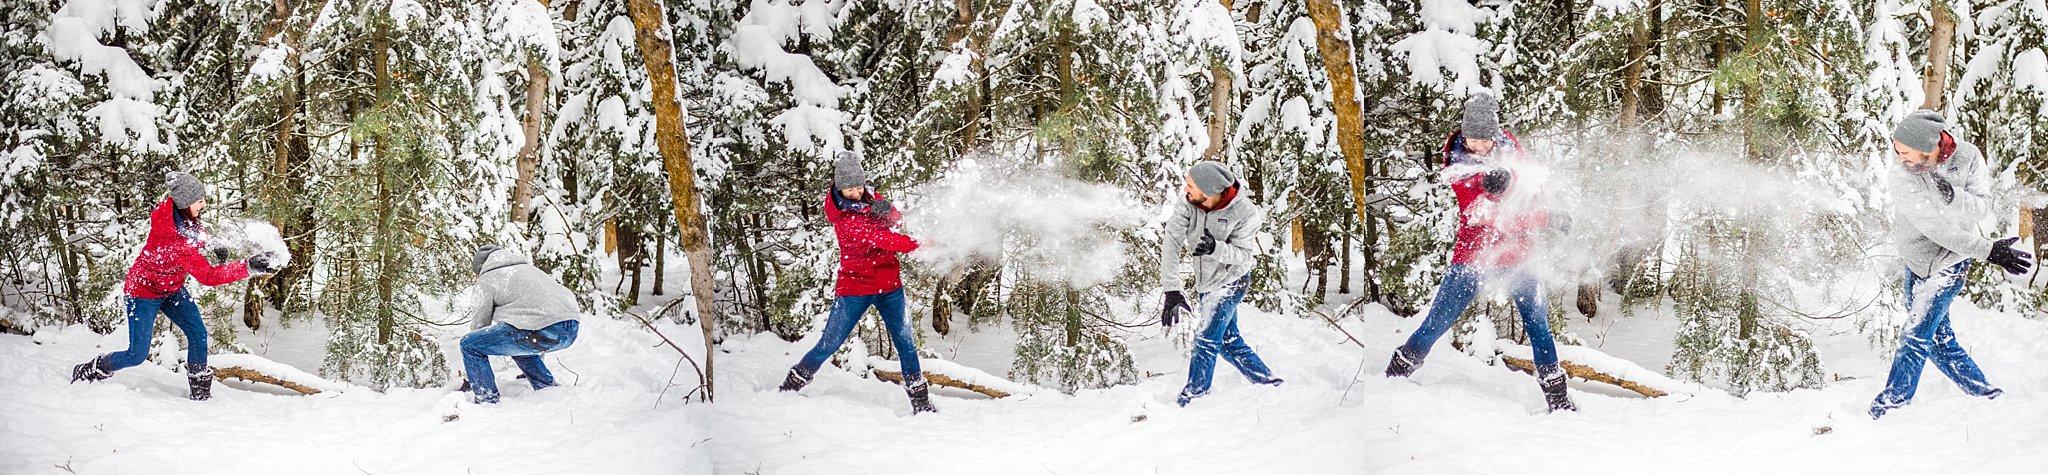 couple photography, salt lake city engagement photographer, millcreek canyon engagement photography, snowy engagement session, mountain engagement